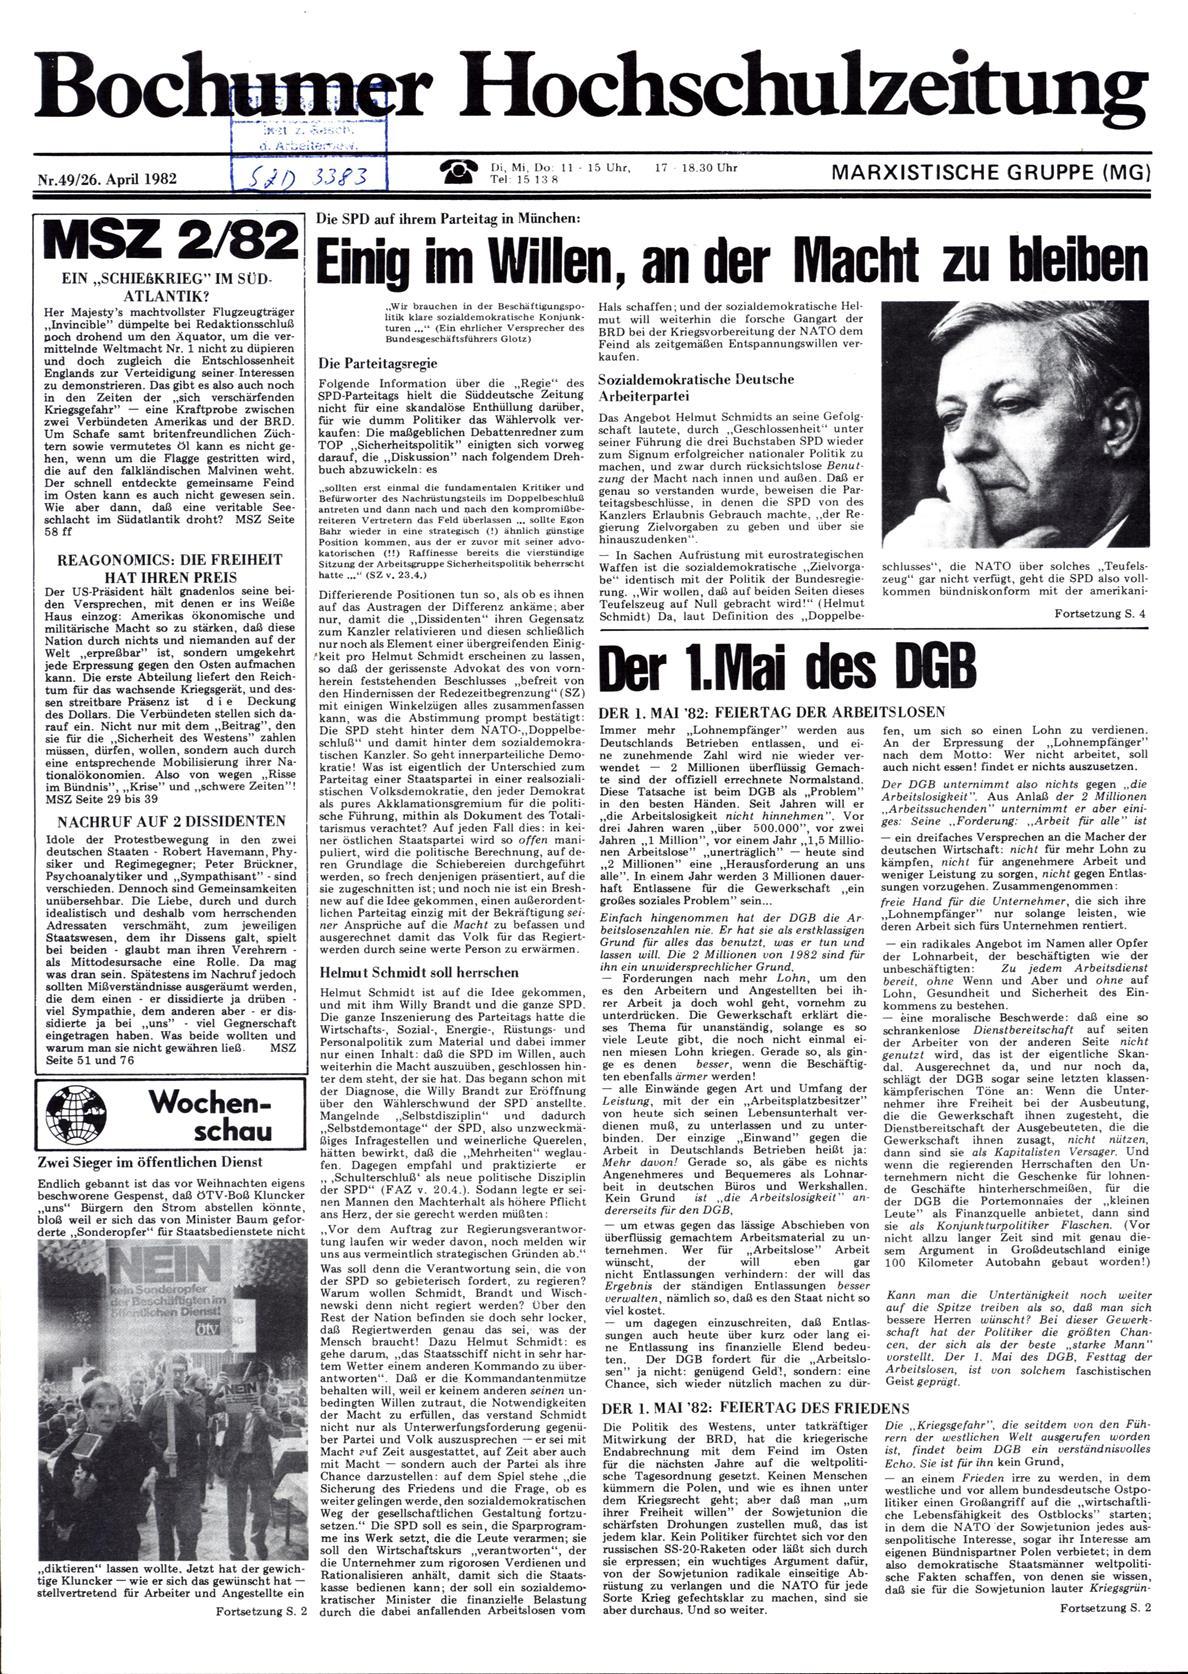 Bochum_BHZ_19820426_049_001